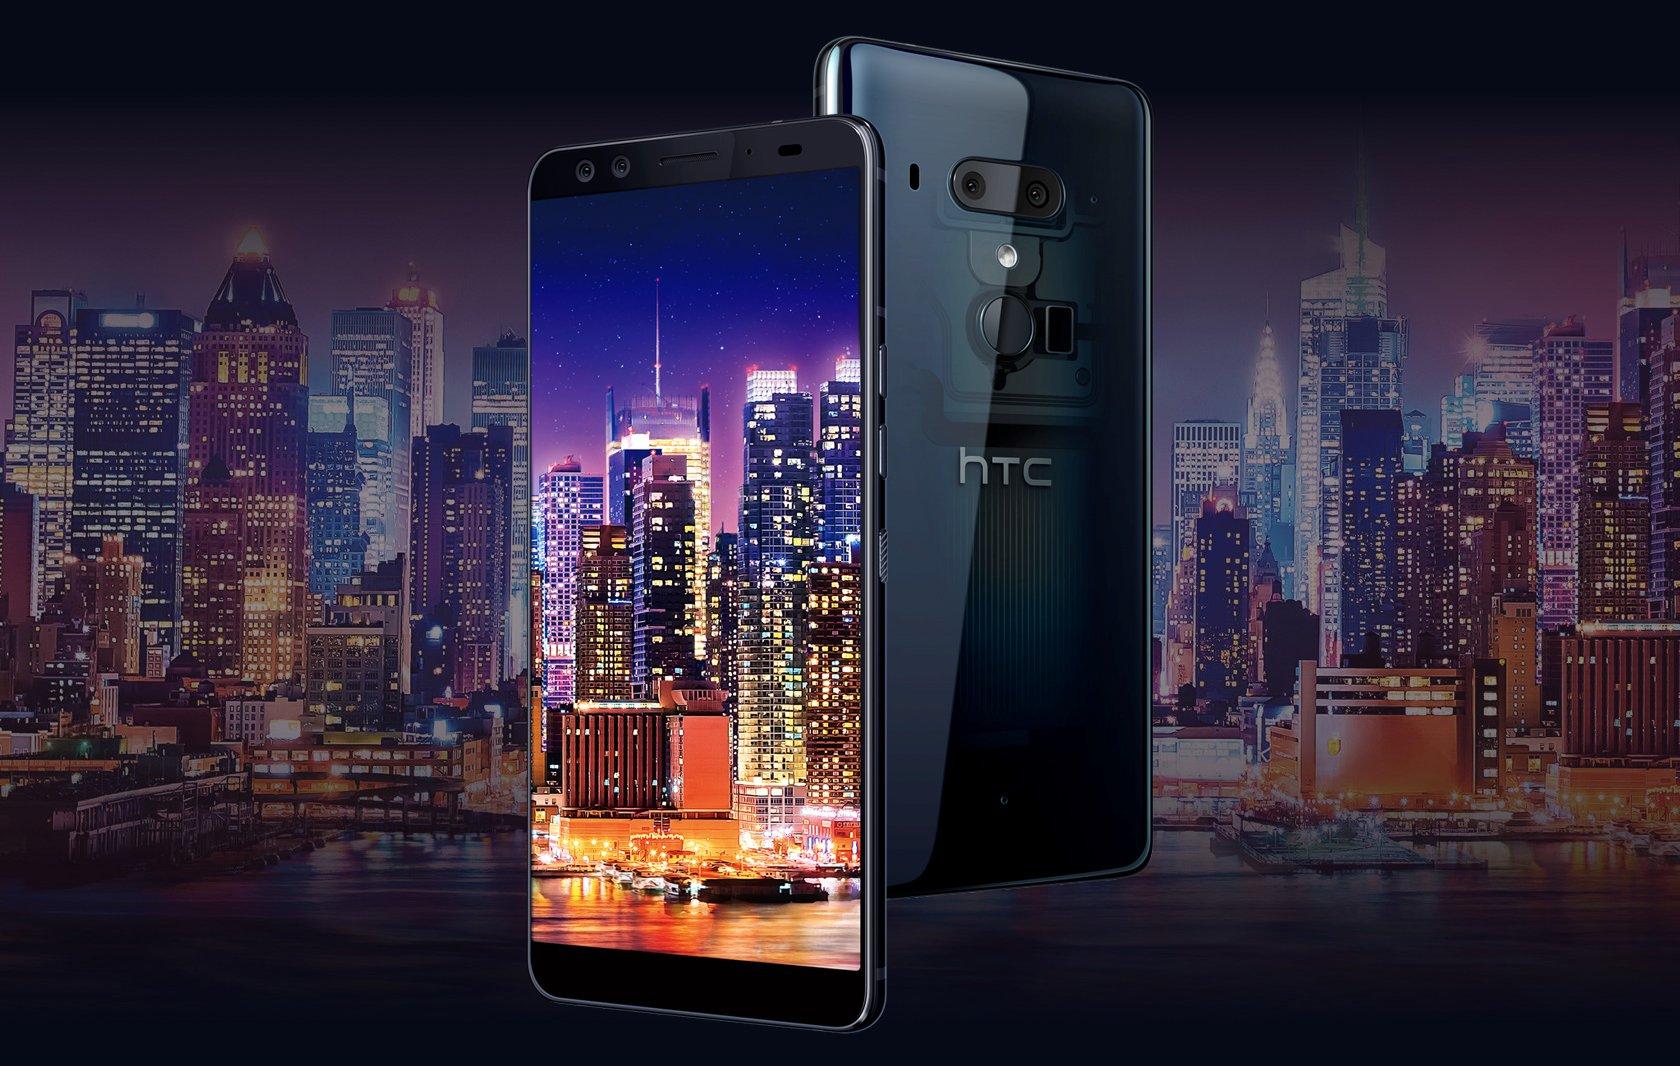 HTC U12+ podwójny aparat 16 + 12 Mpix EIS OIS laserowy autofocus HDR